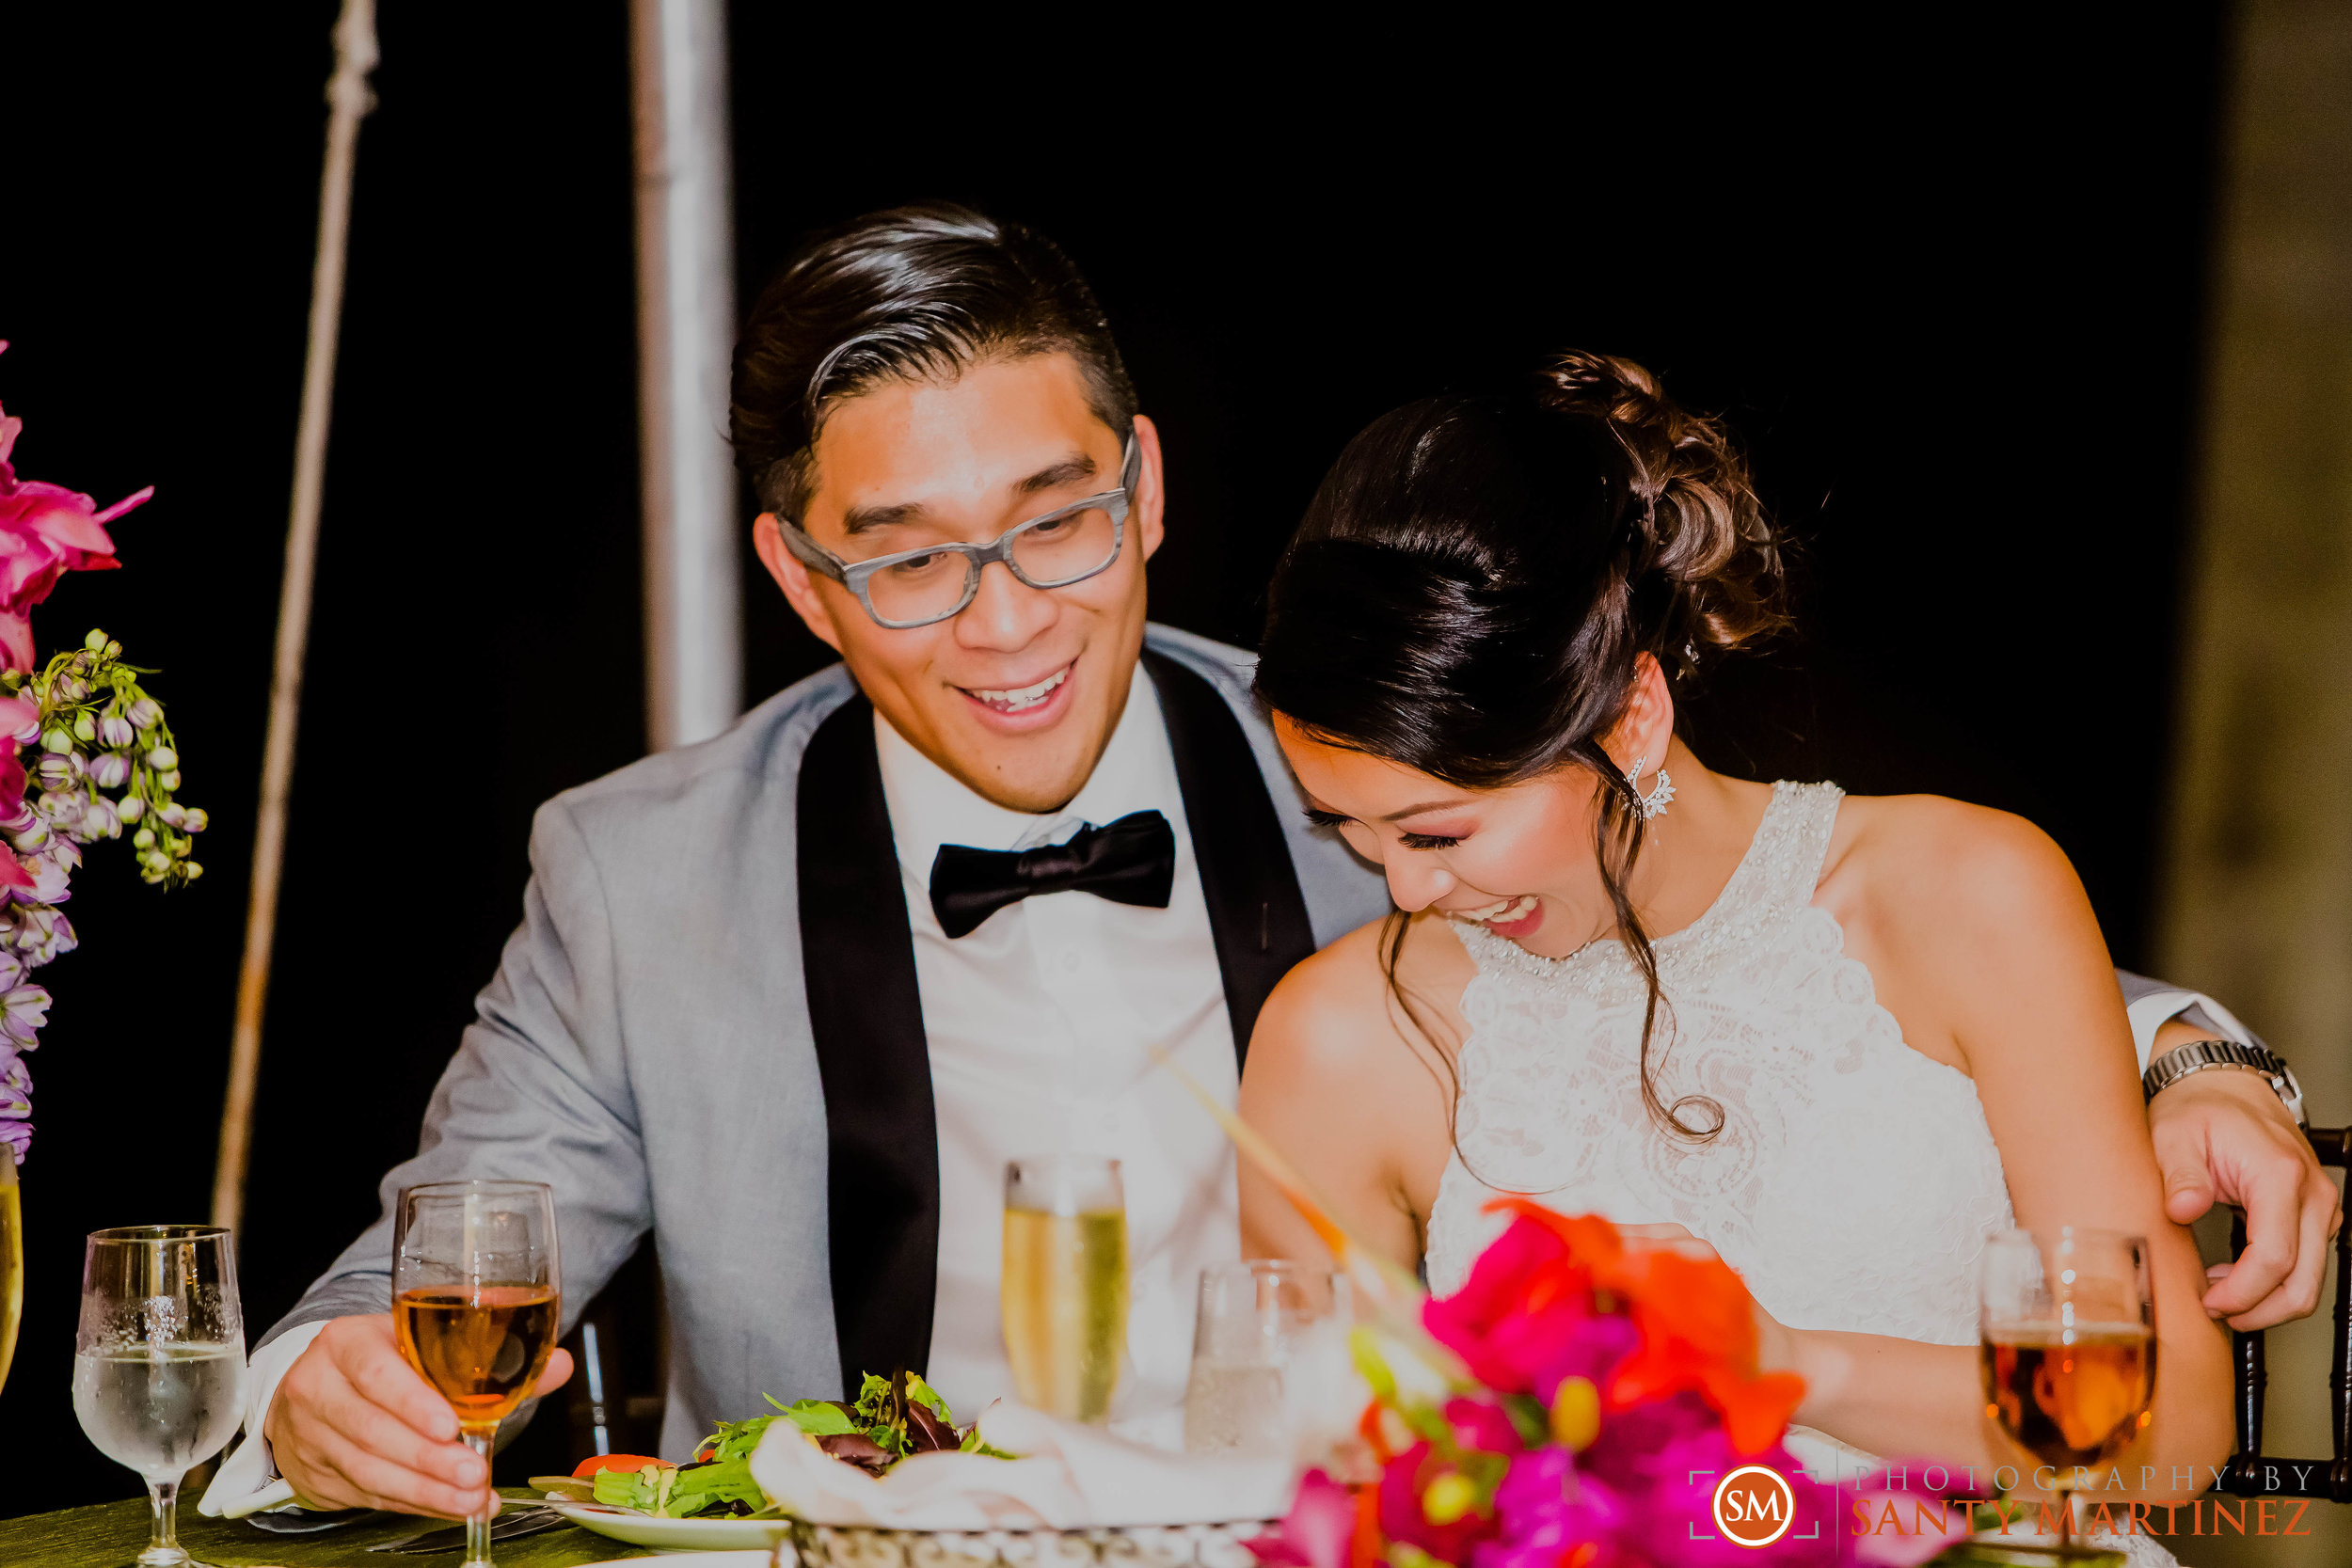 Wedding Bonnet House - Photography by Santy Martinez-43.jpg